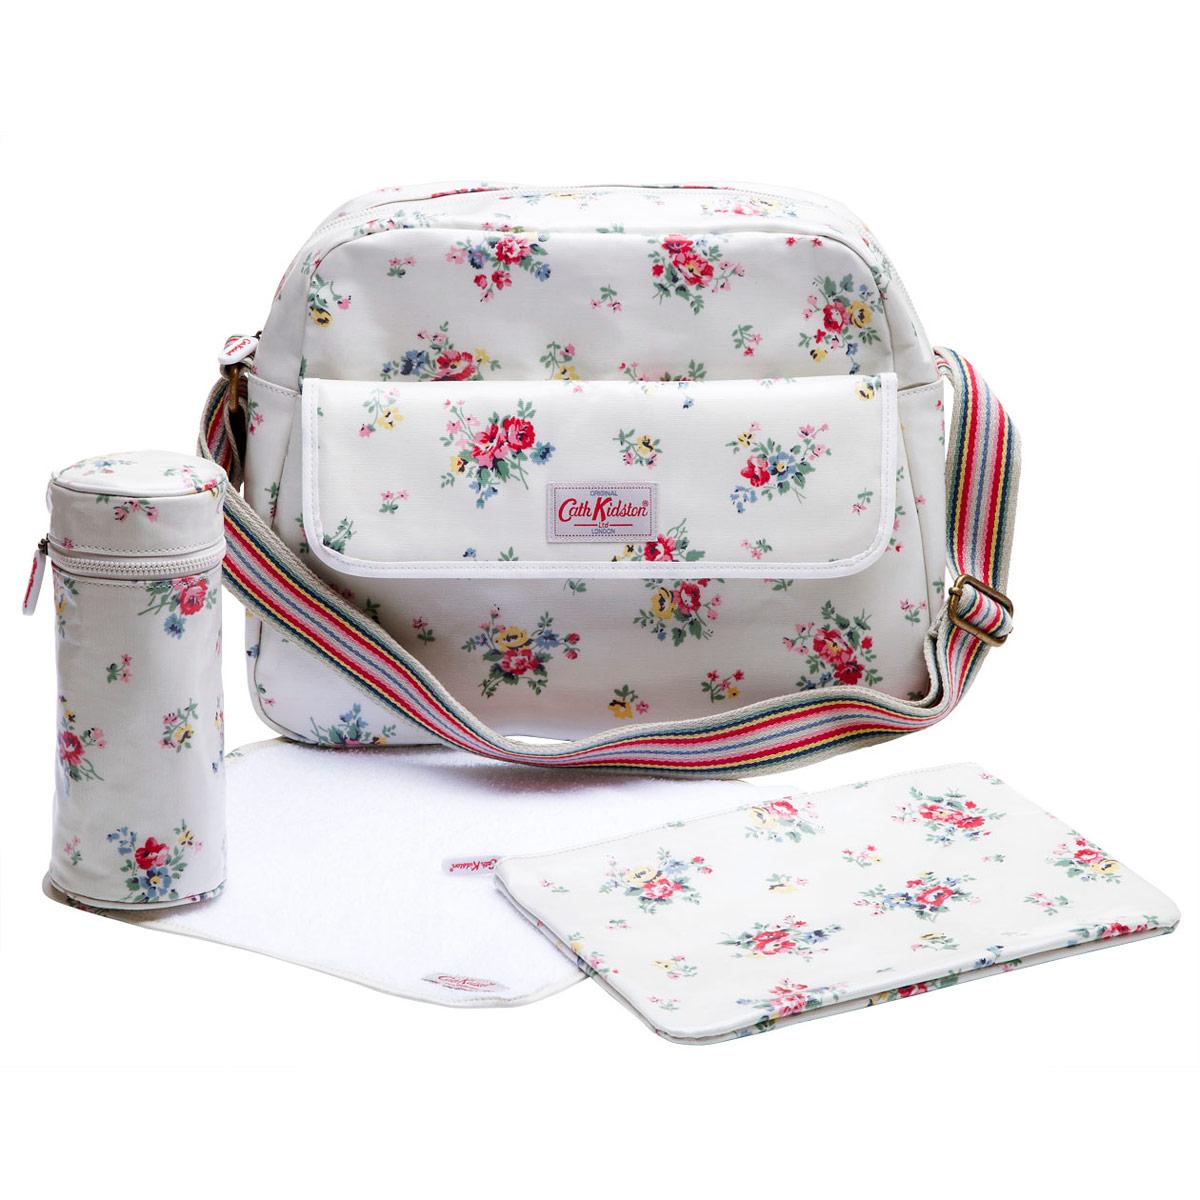 need a fashionable diaper bag malefashionadvice